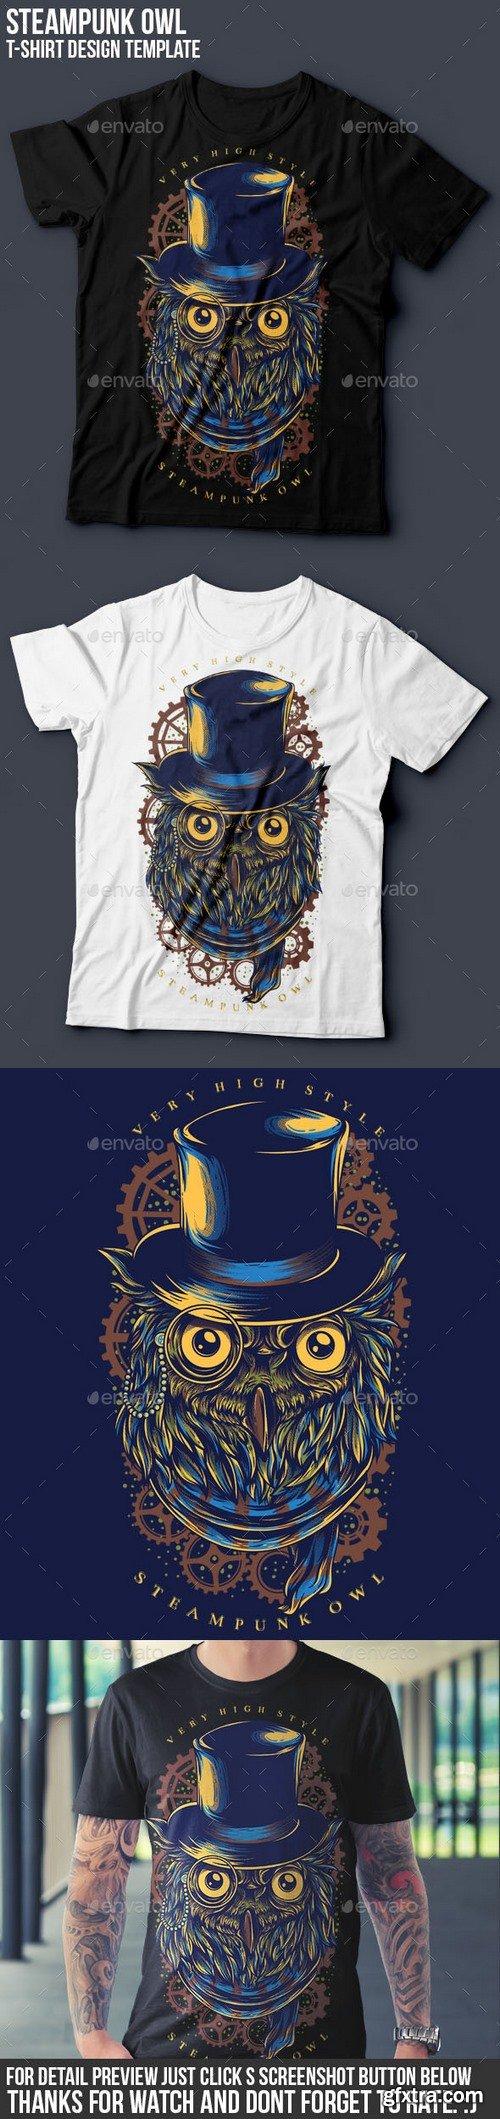 Graphicriver - Steampunk Owl T-Shirt Design 16048272